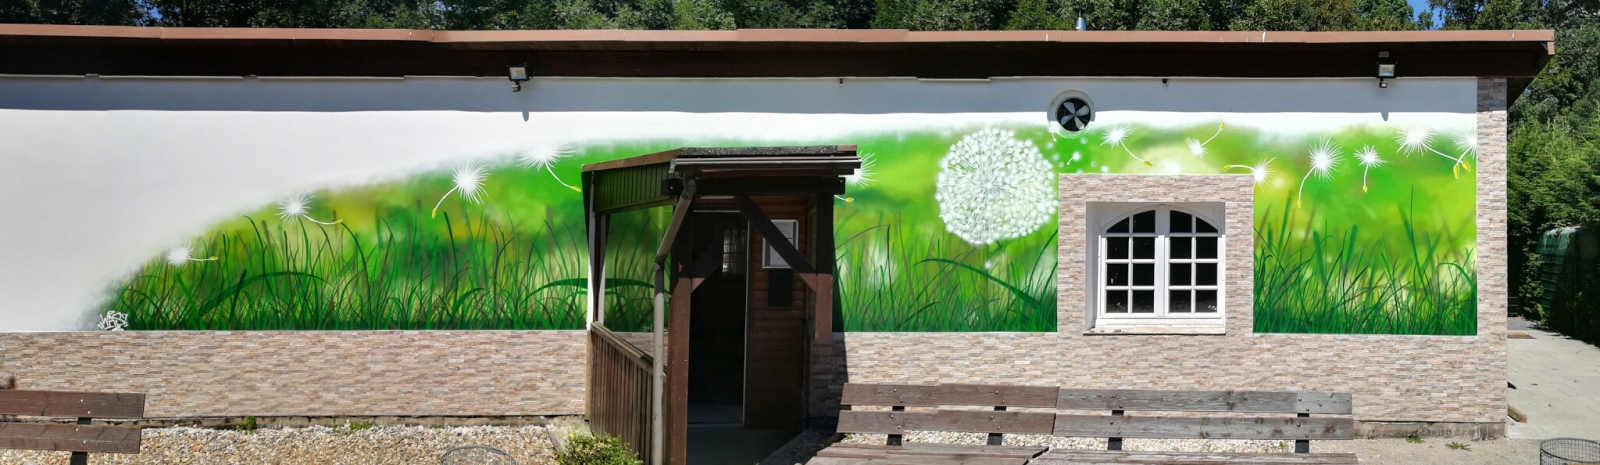 Graffiti Garten Pusteblume Wiese Essen